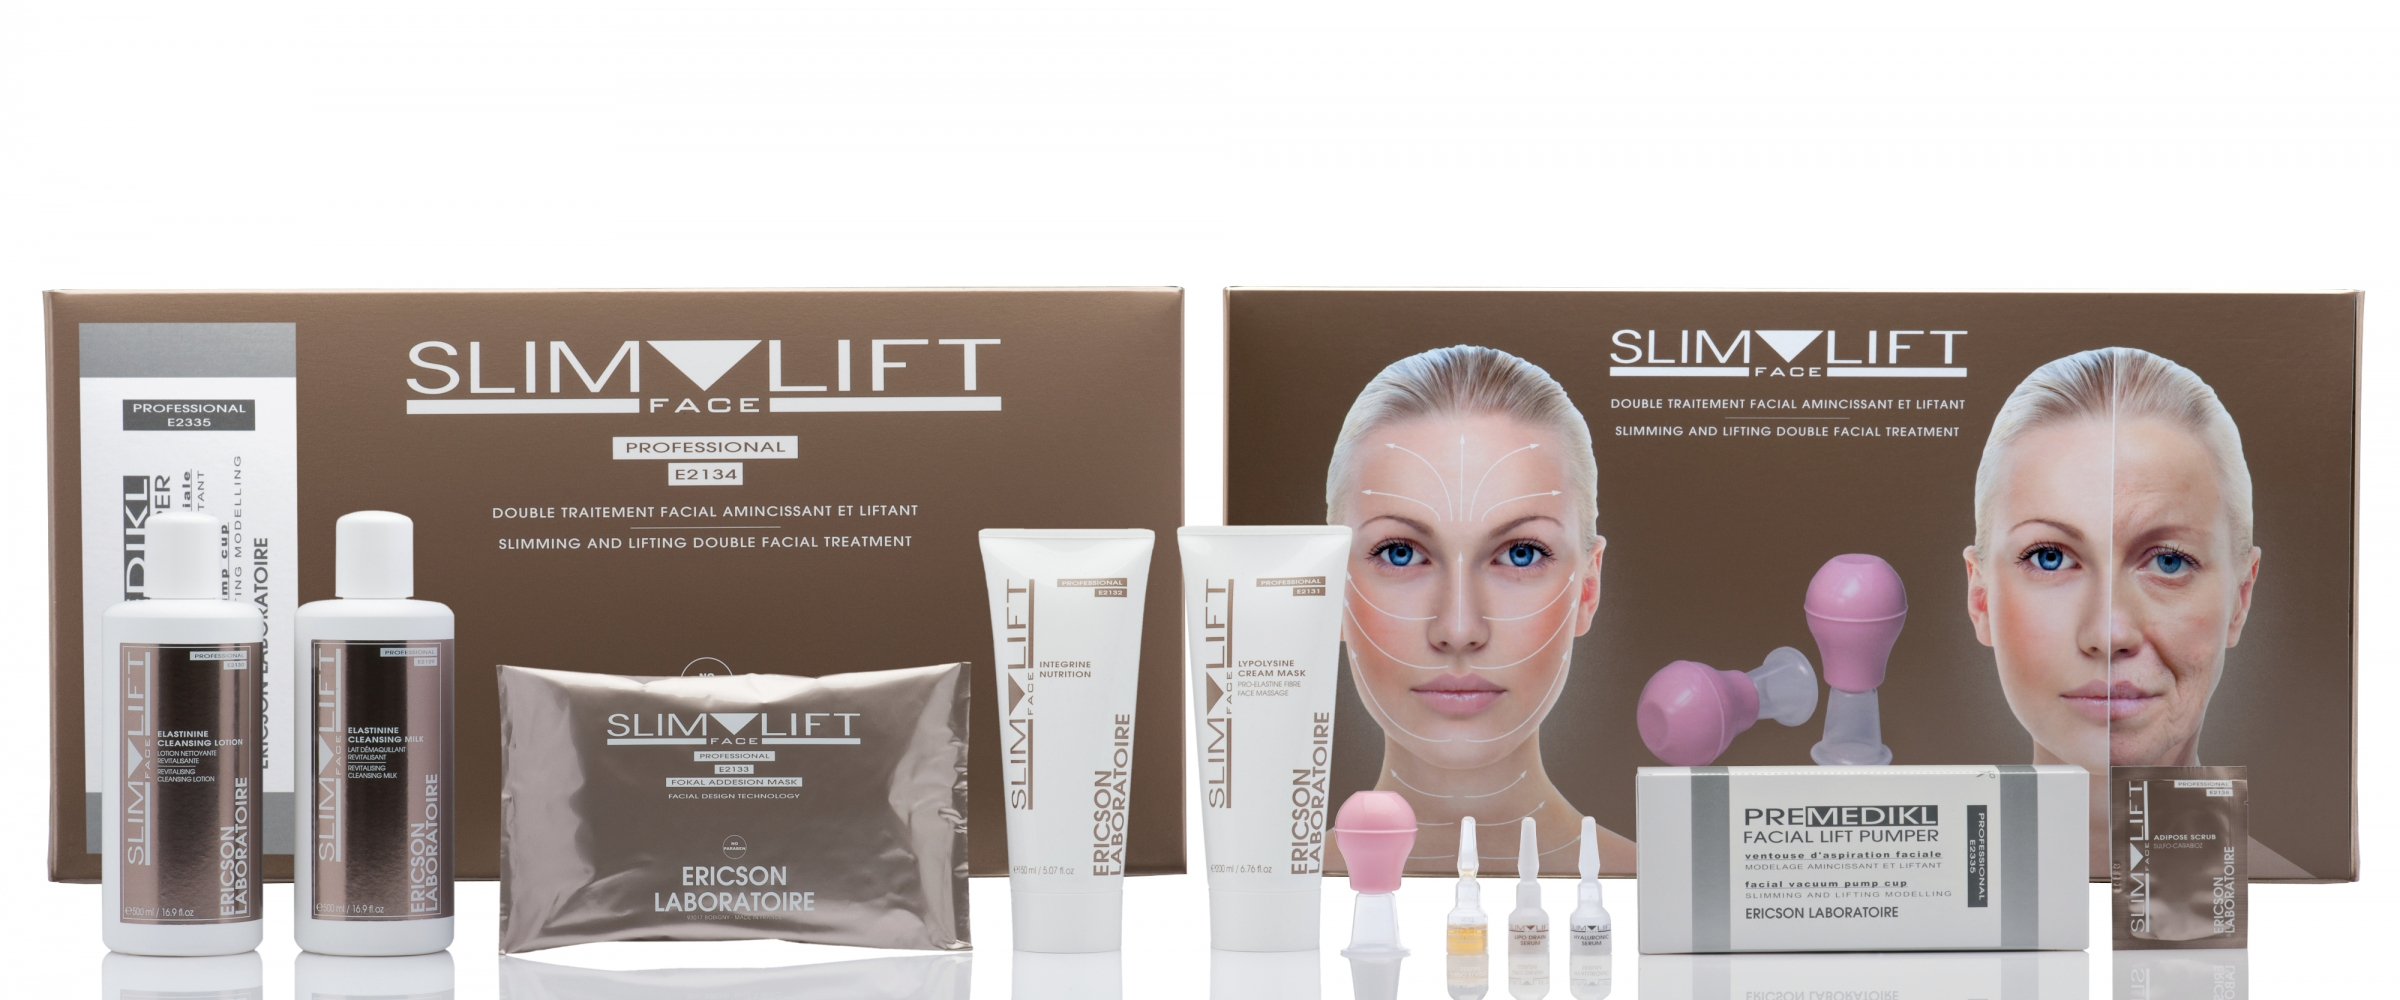 Slim-Face-Lift-pro8 - AM